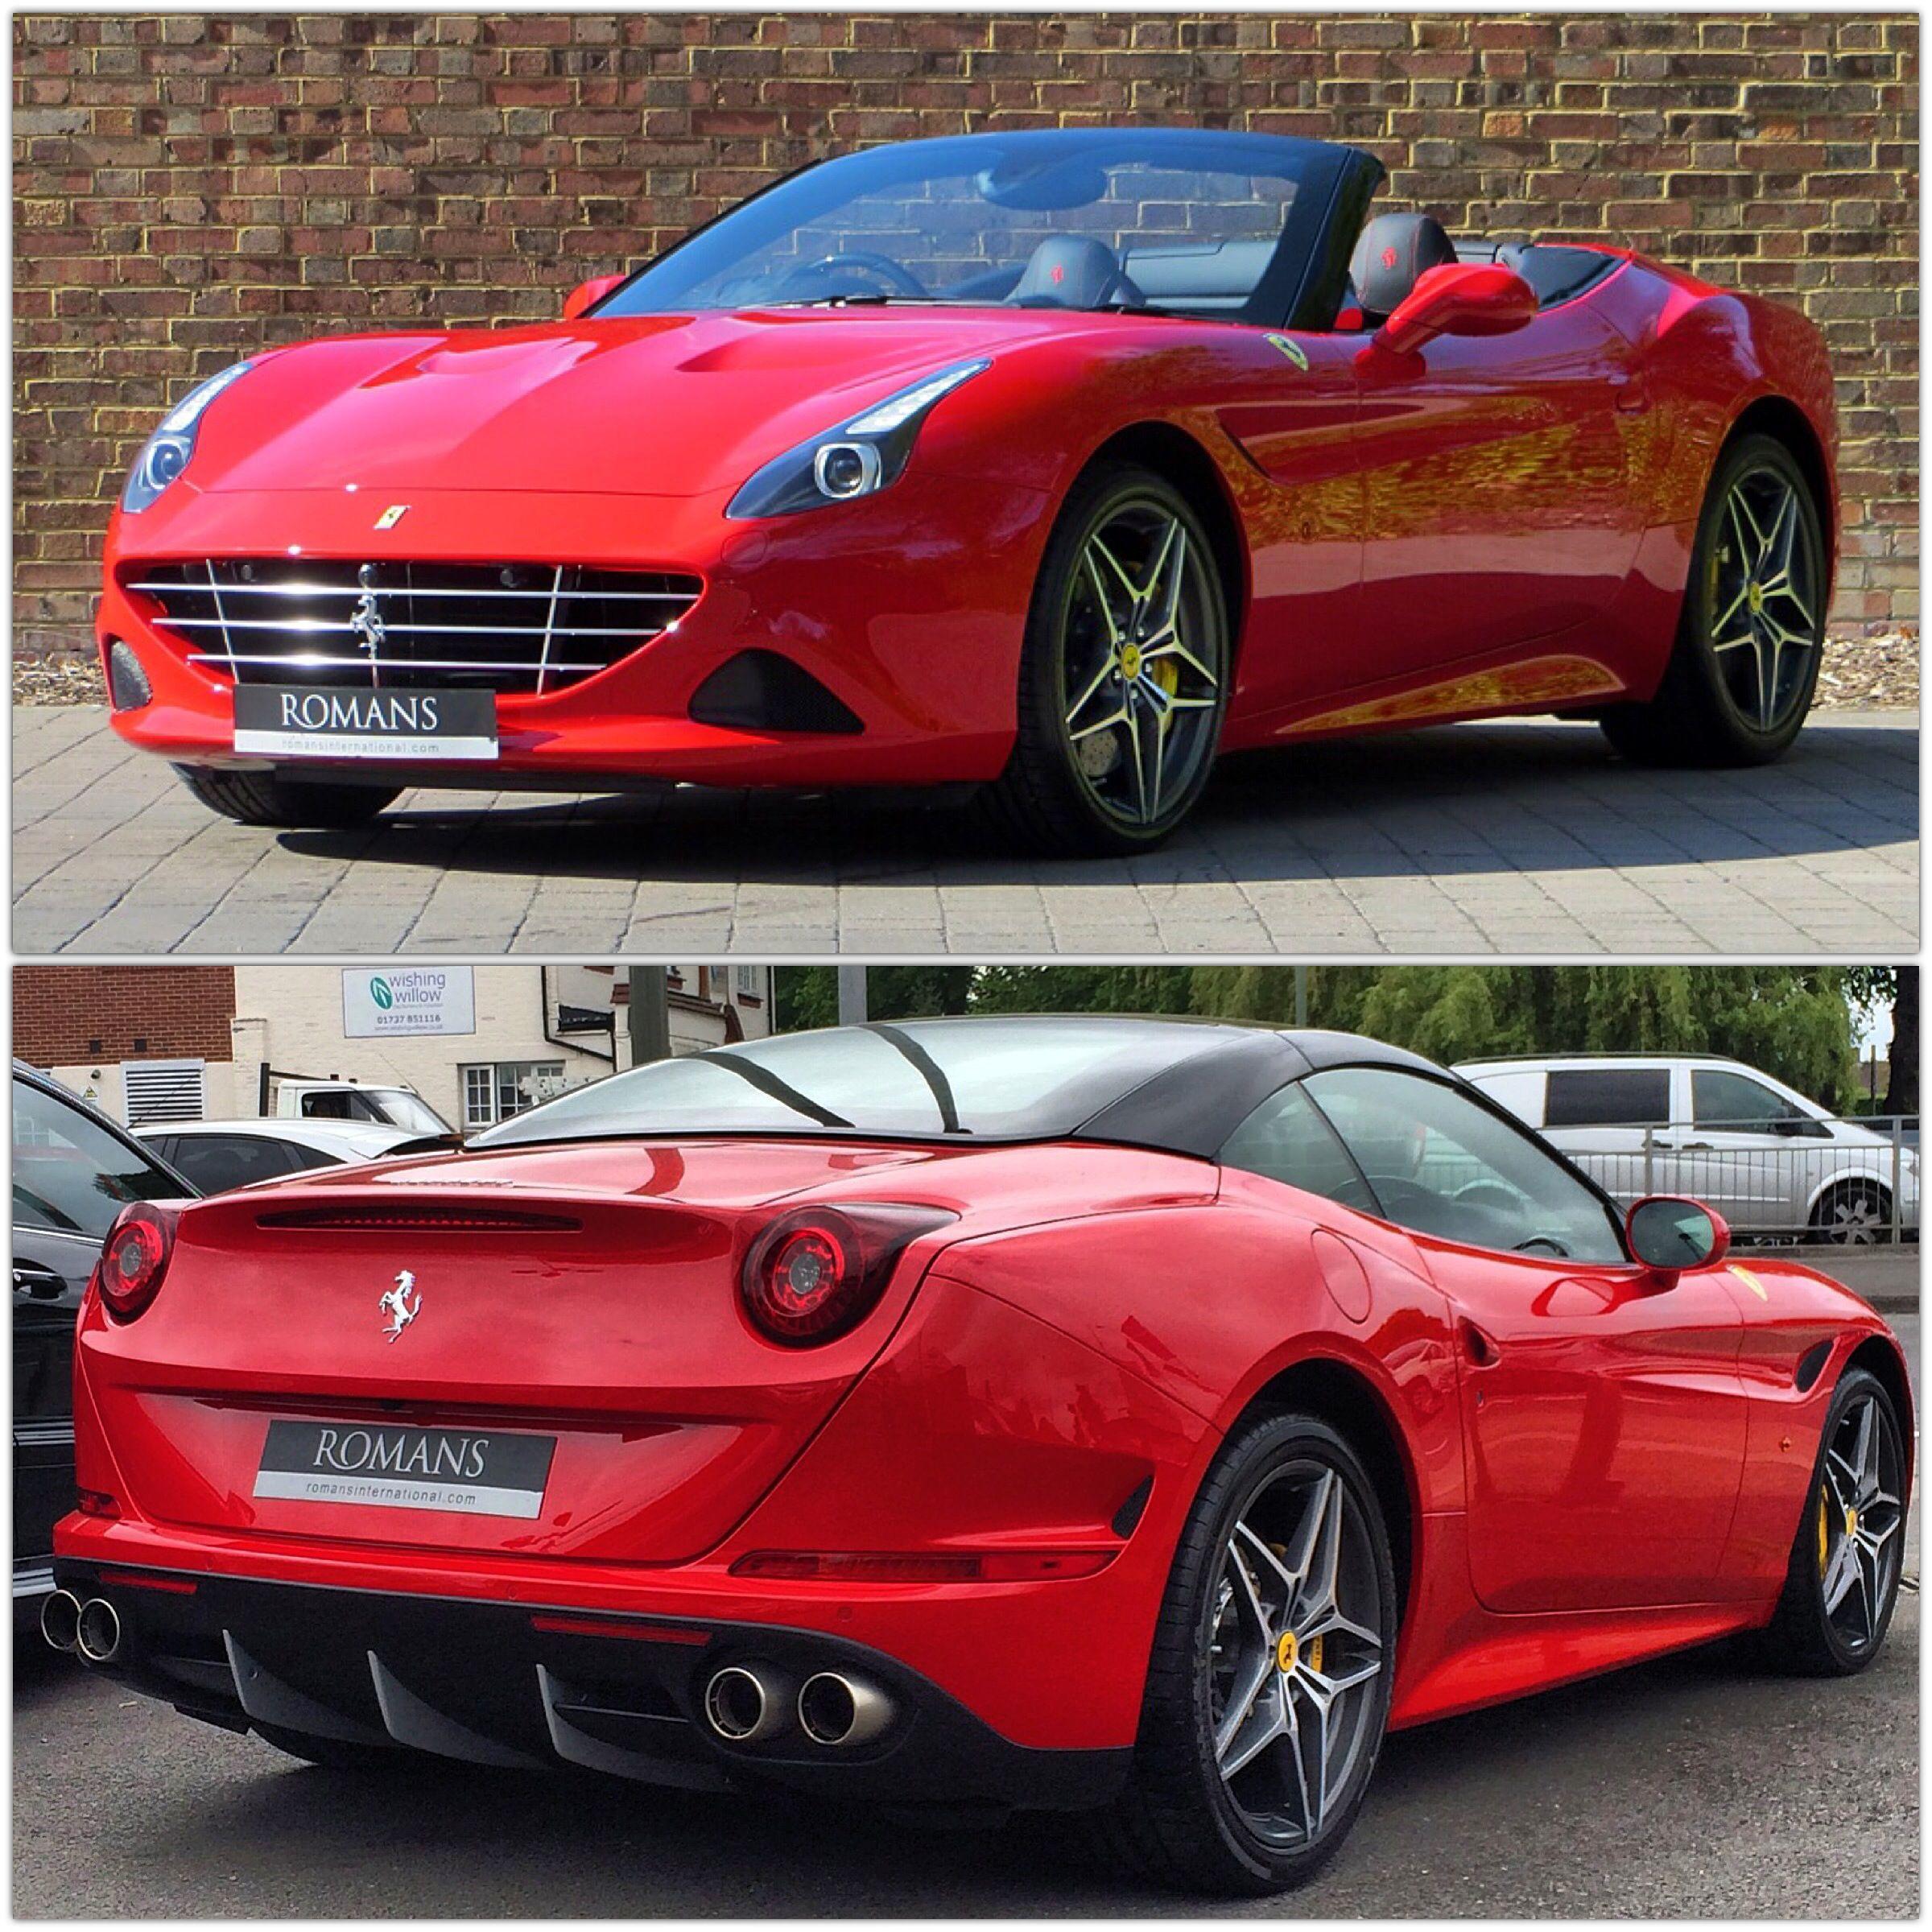 Used   Ferrari california t, Ferrari california, Ferrari